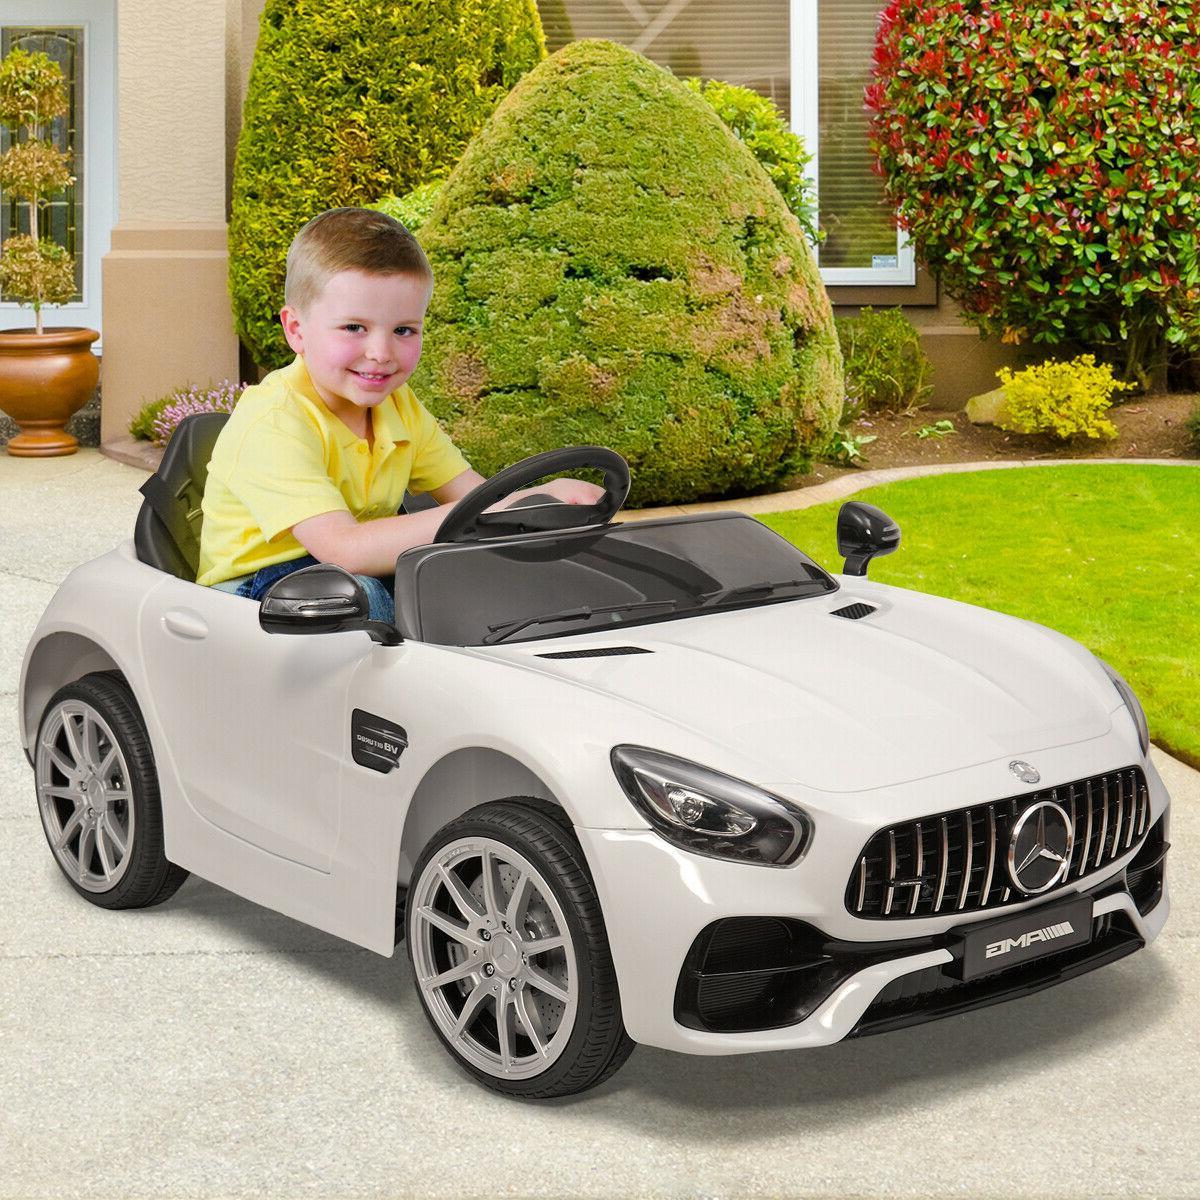 12V On Mercedes Electric Led Control White